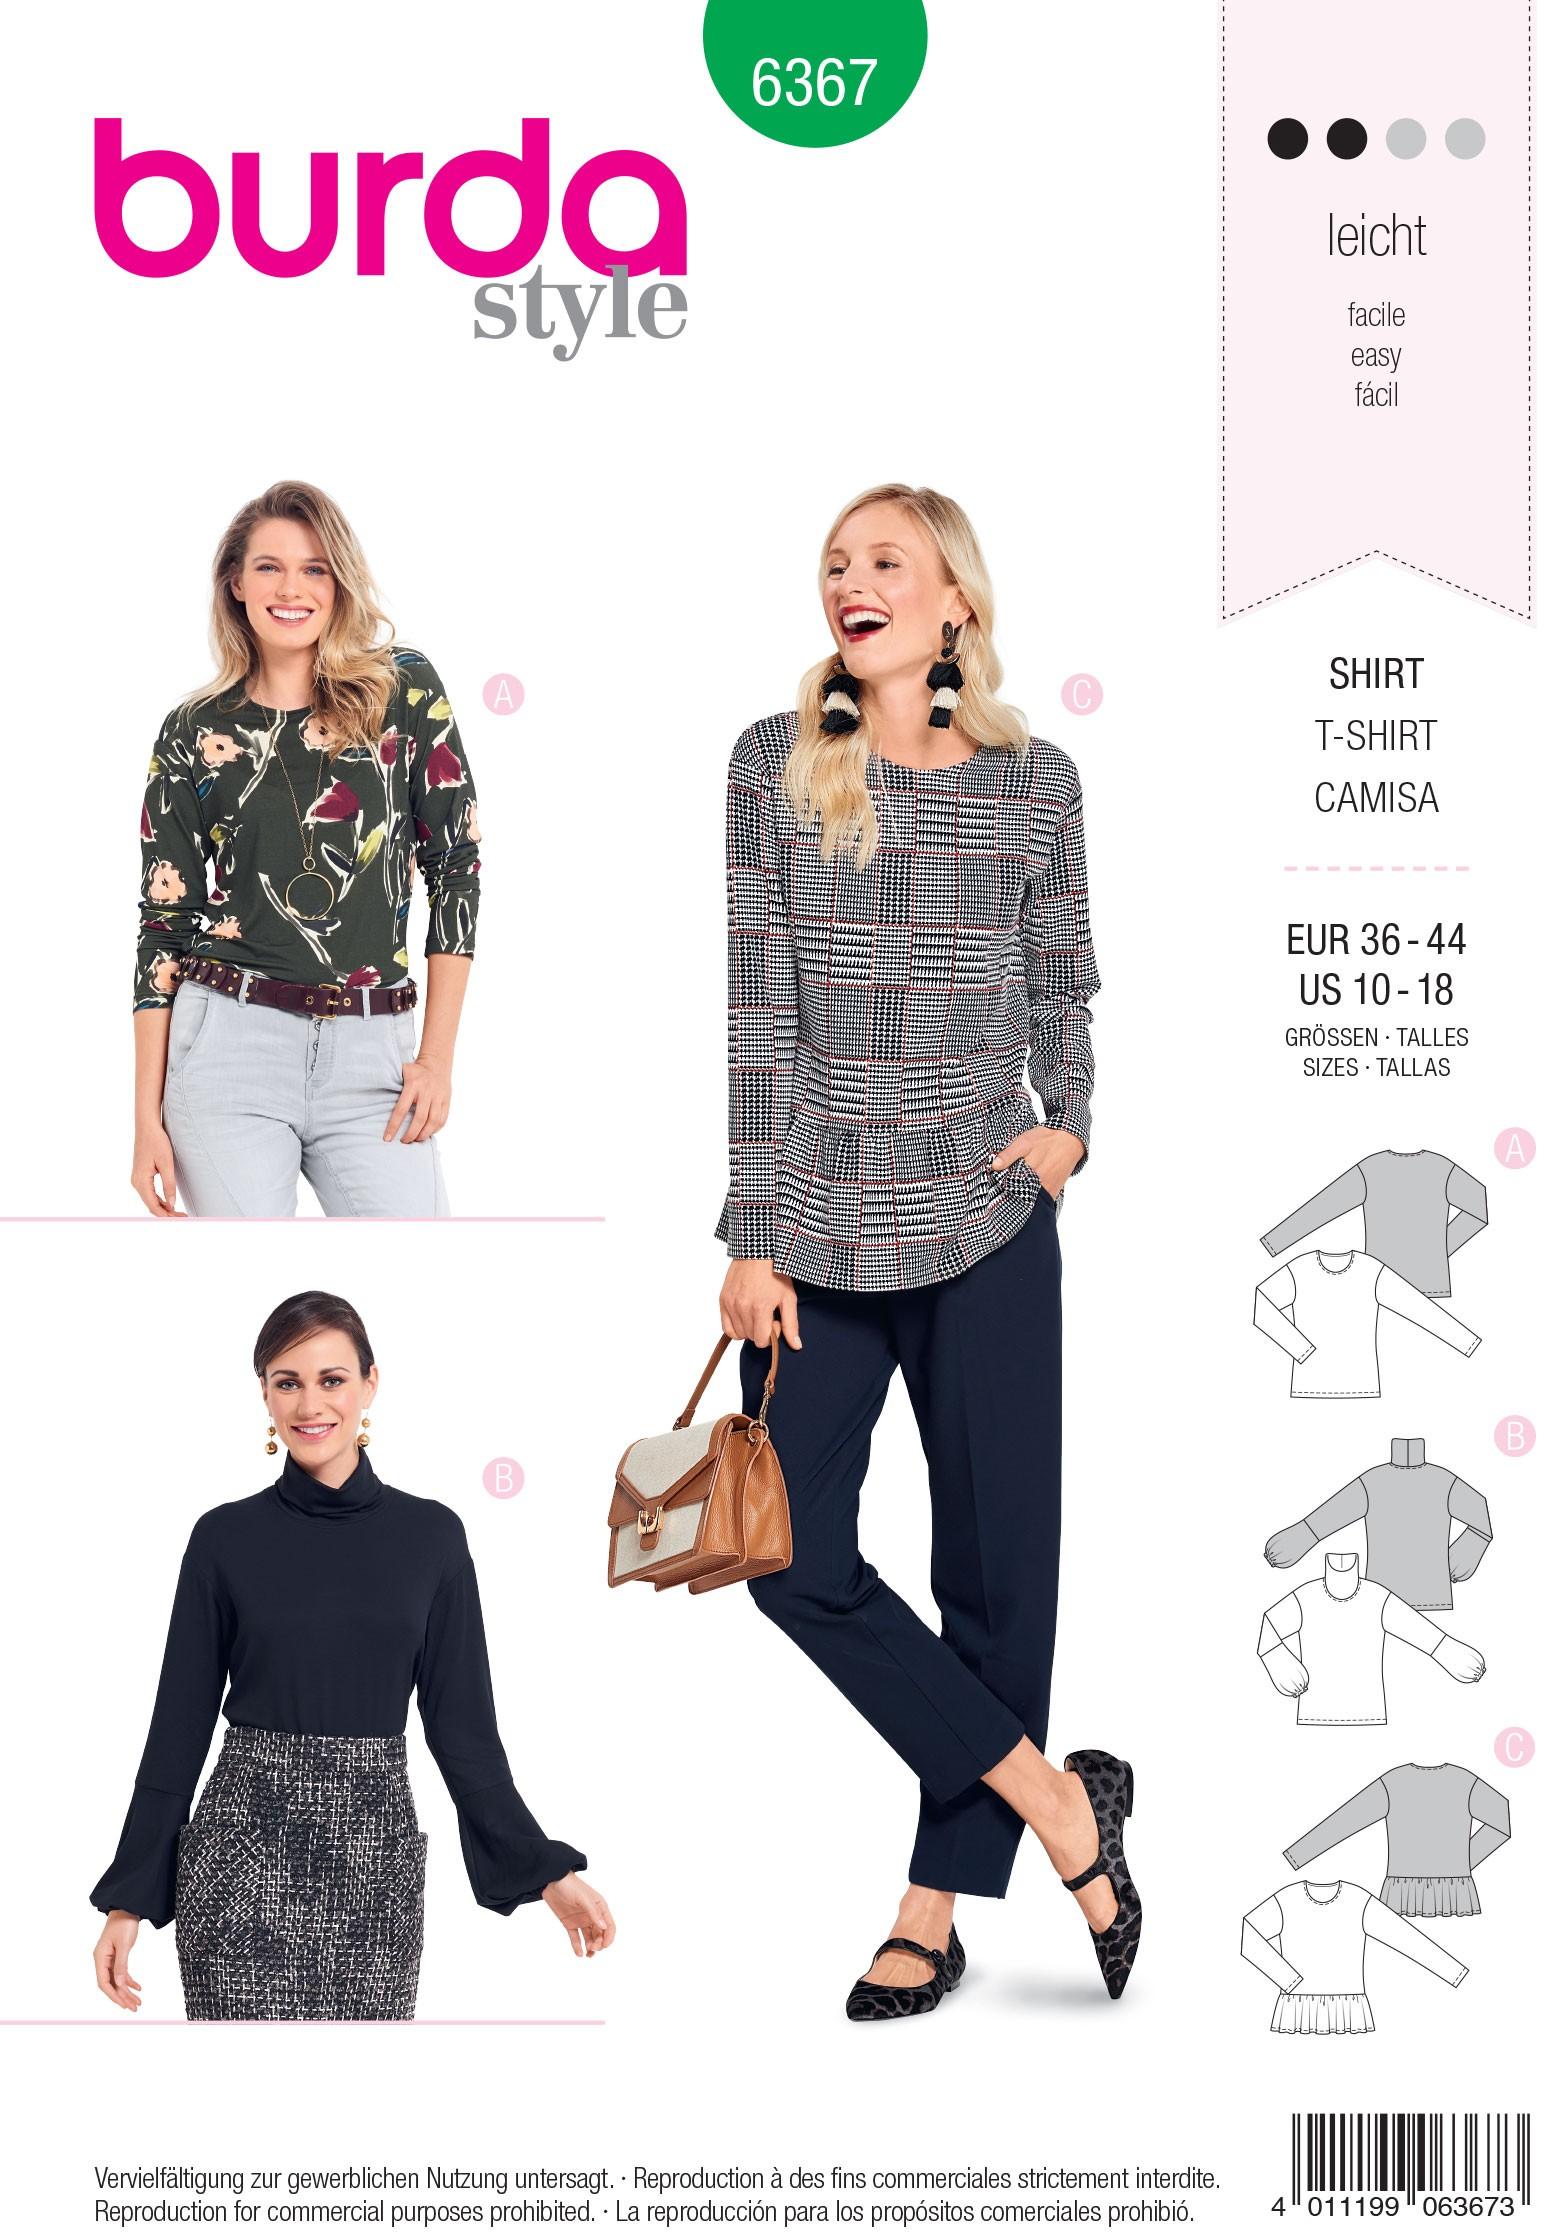 Burda Style Misses' Classic Plain Top Sewing Pattern 6367